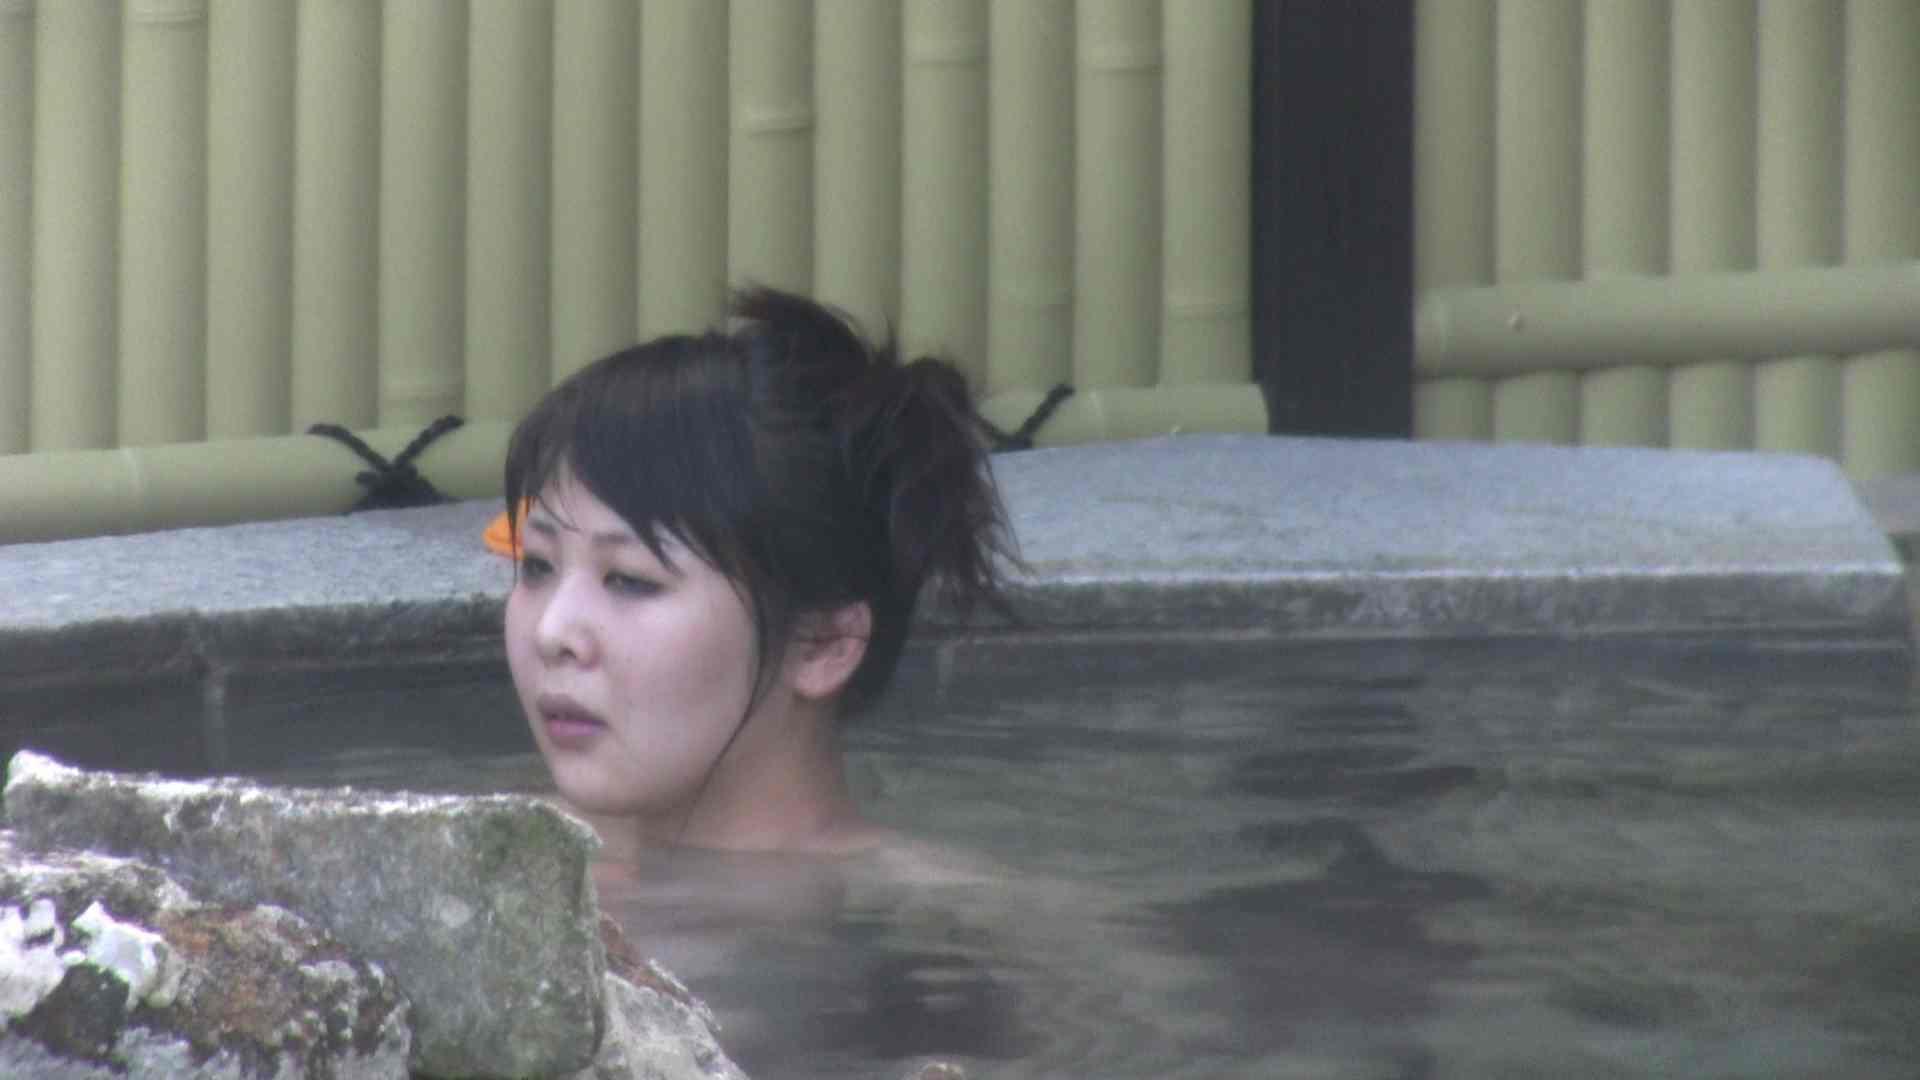 Aquaな露天風呂Vol.118 0 | 露天  85連発 21